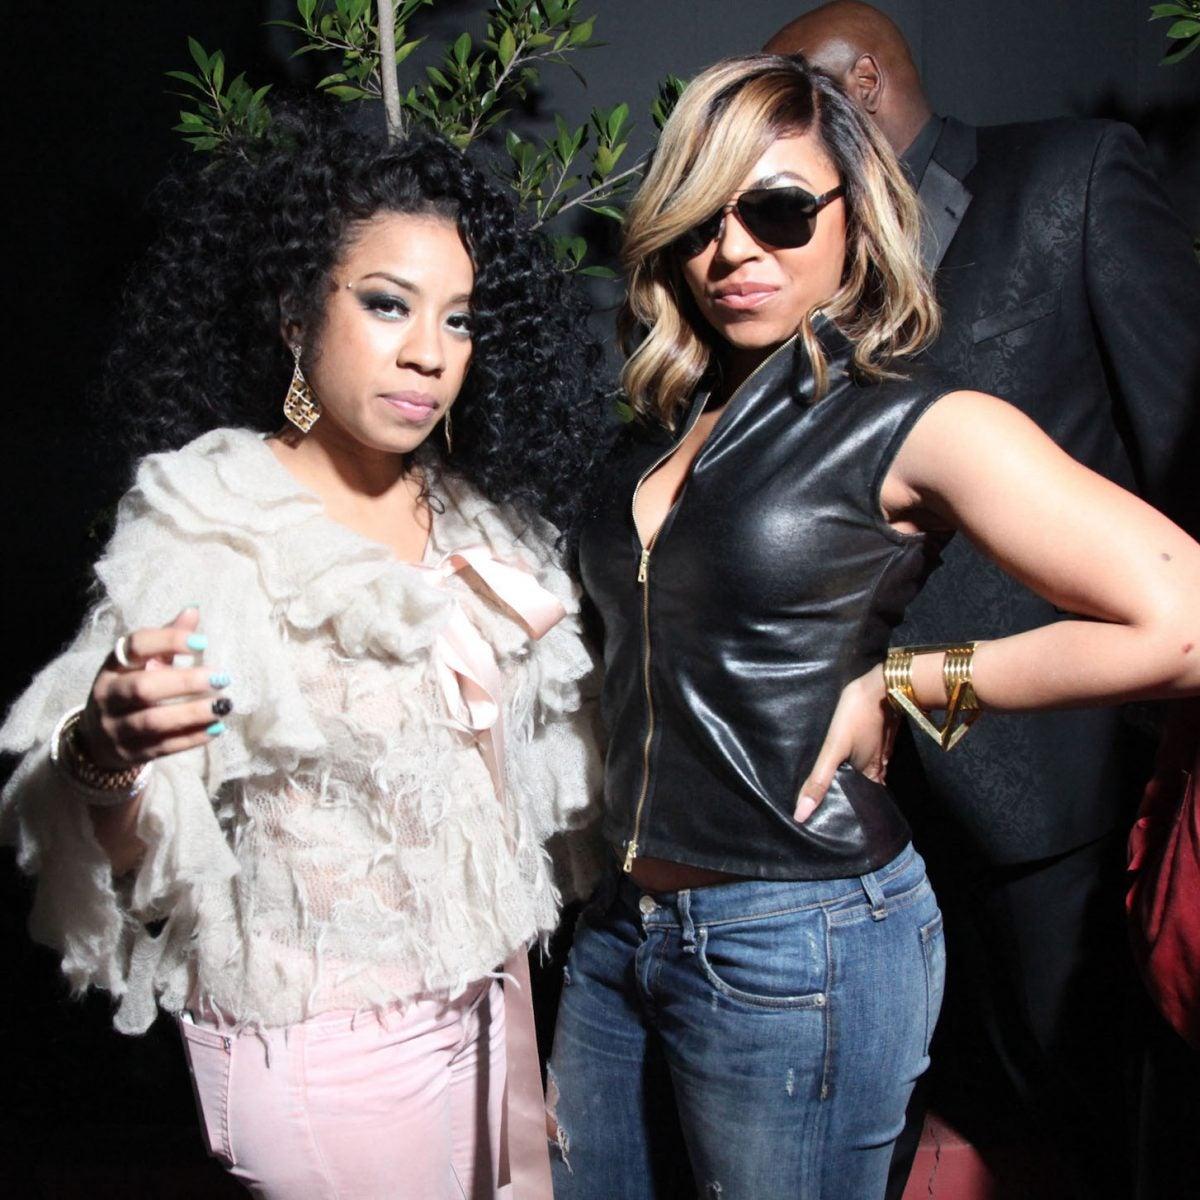 Verzuz Battle With Keyshia Cole & Ashanti Is Postponed Again